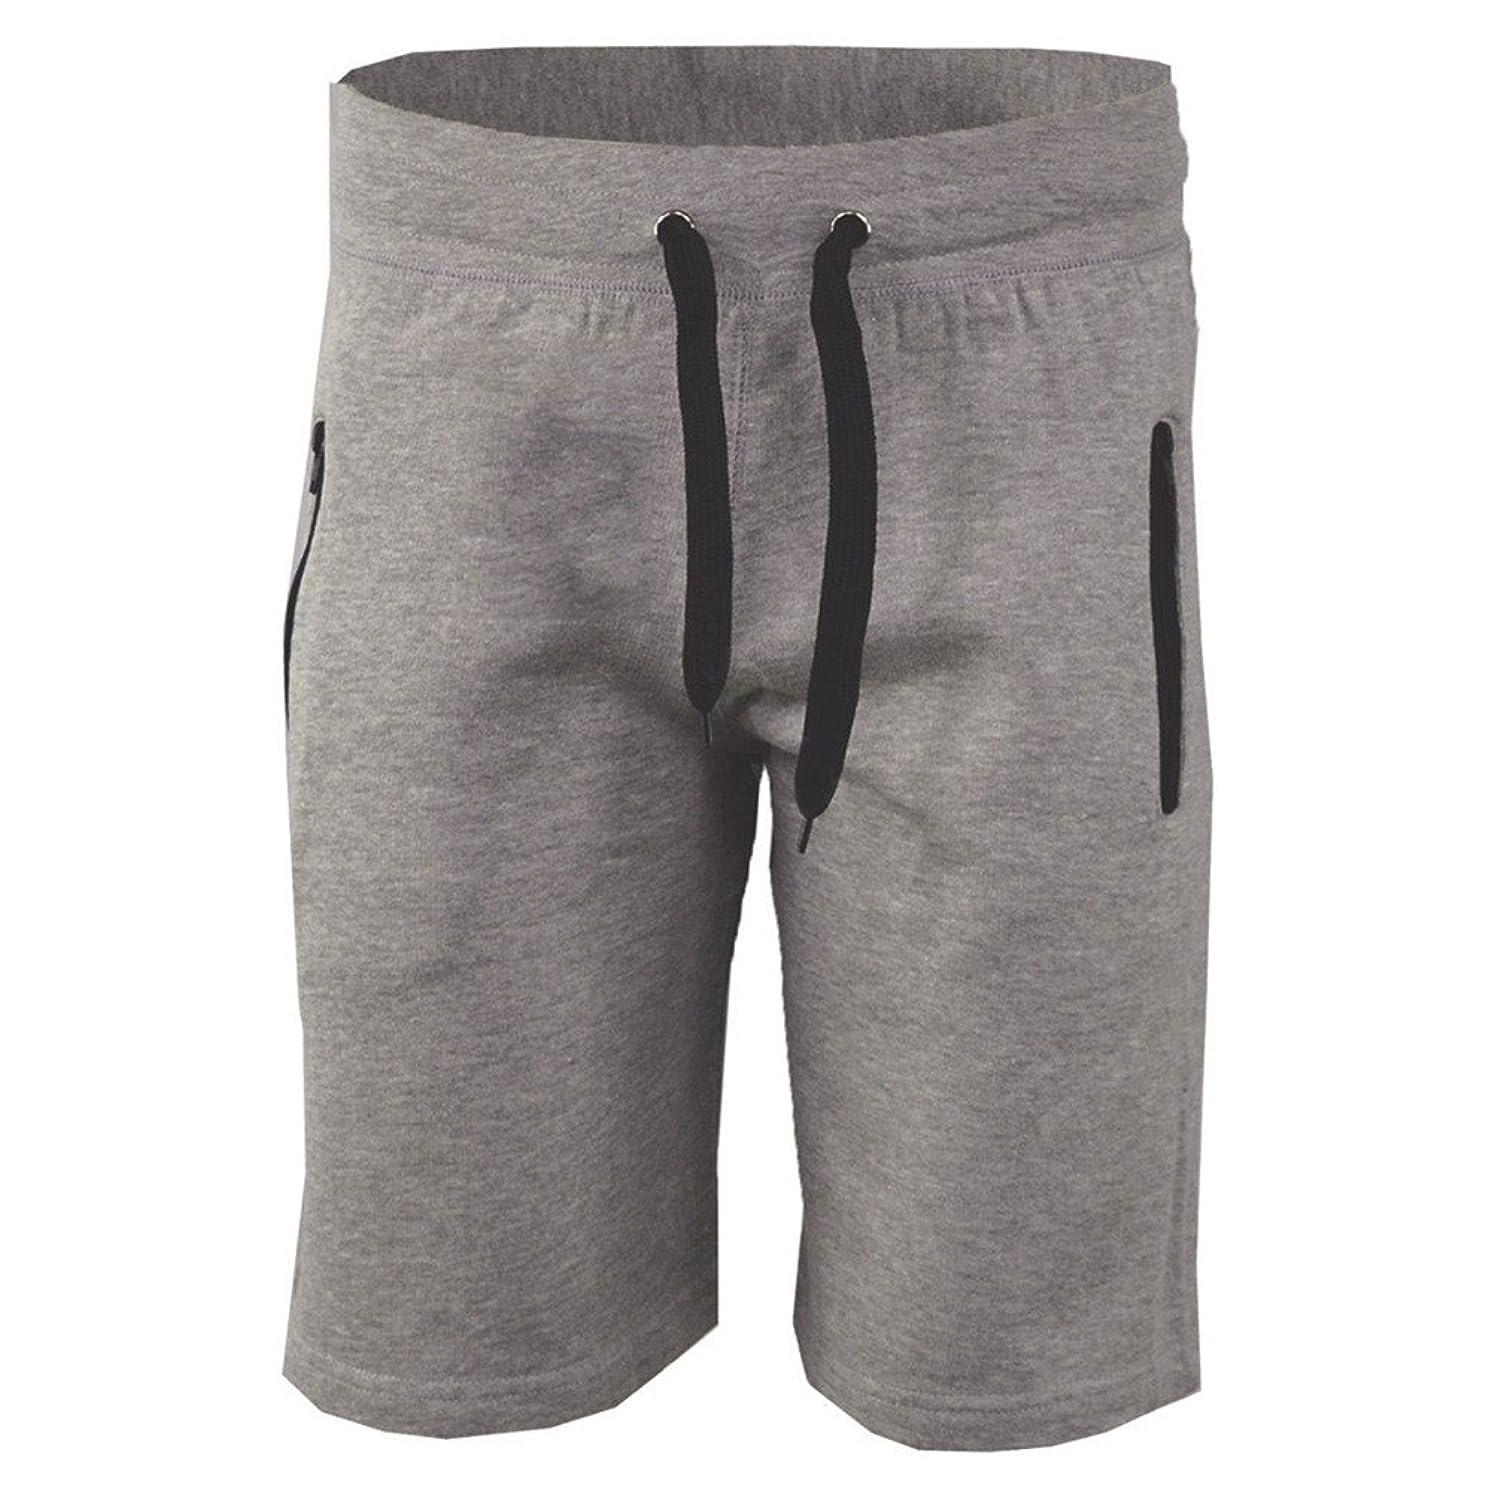 JJLIEKR Men's Elastic Waist Drawstring Shorts Comfortable Breathable Cotton Casual Sport Half Pants with Zip Pocket